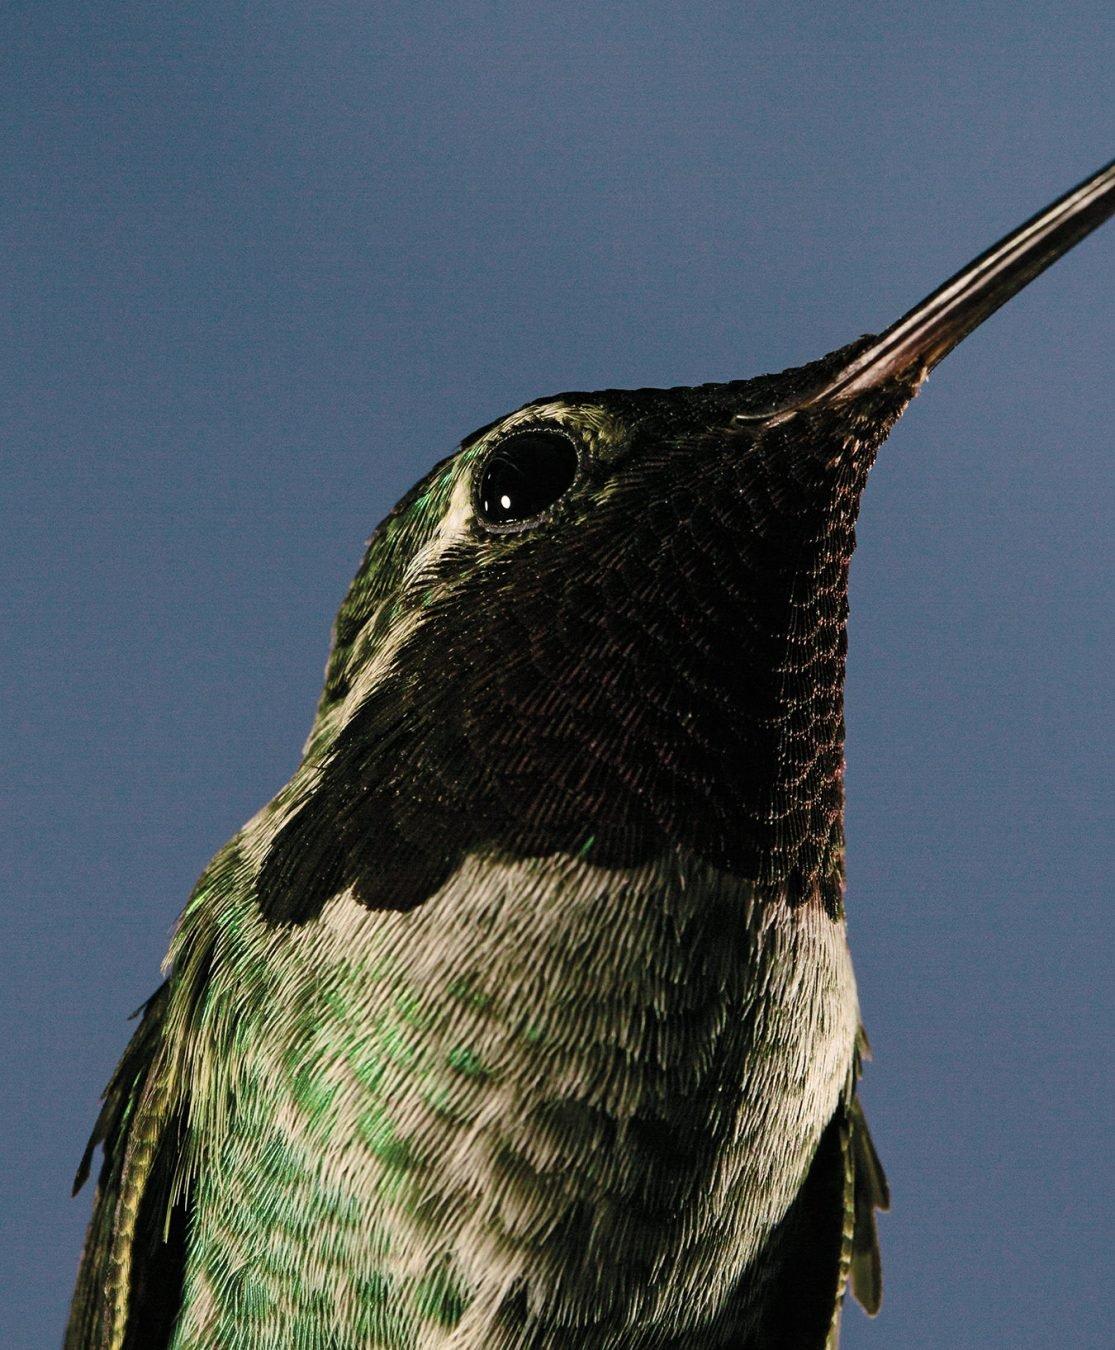 Hummingbird Research at UBC